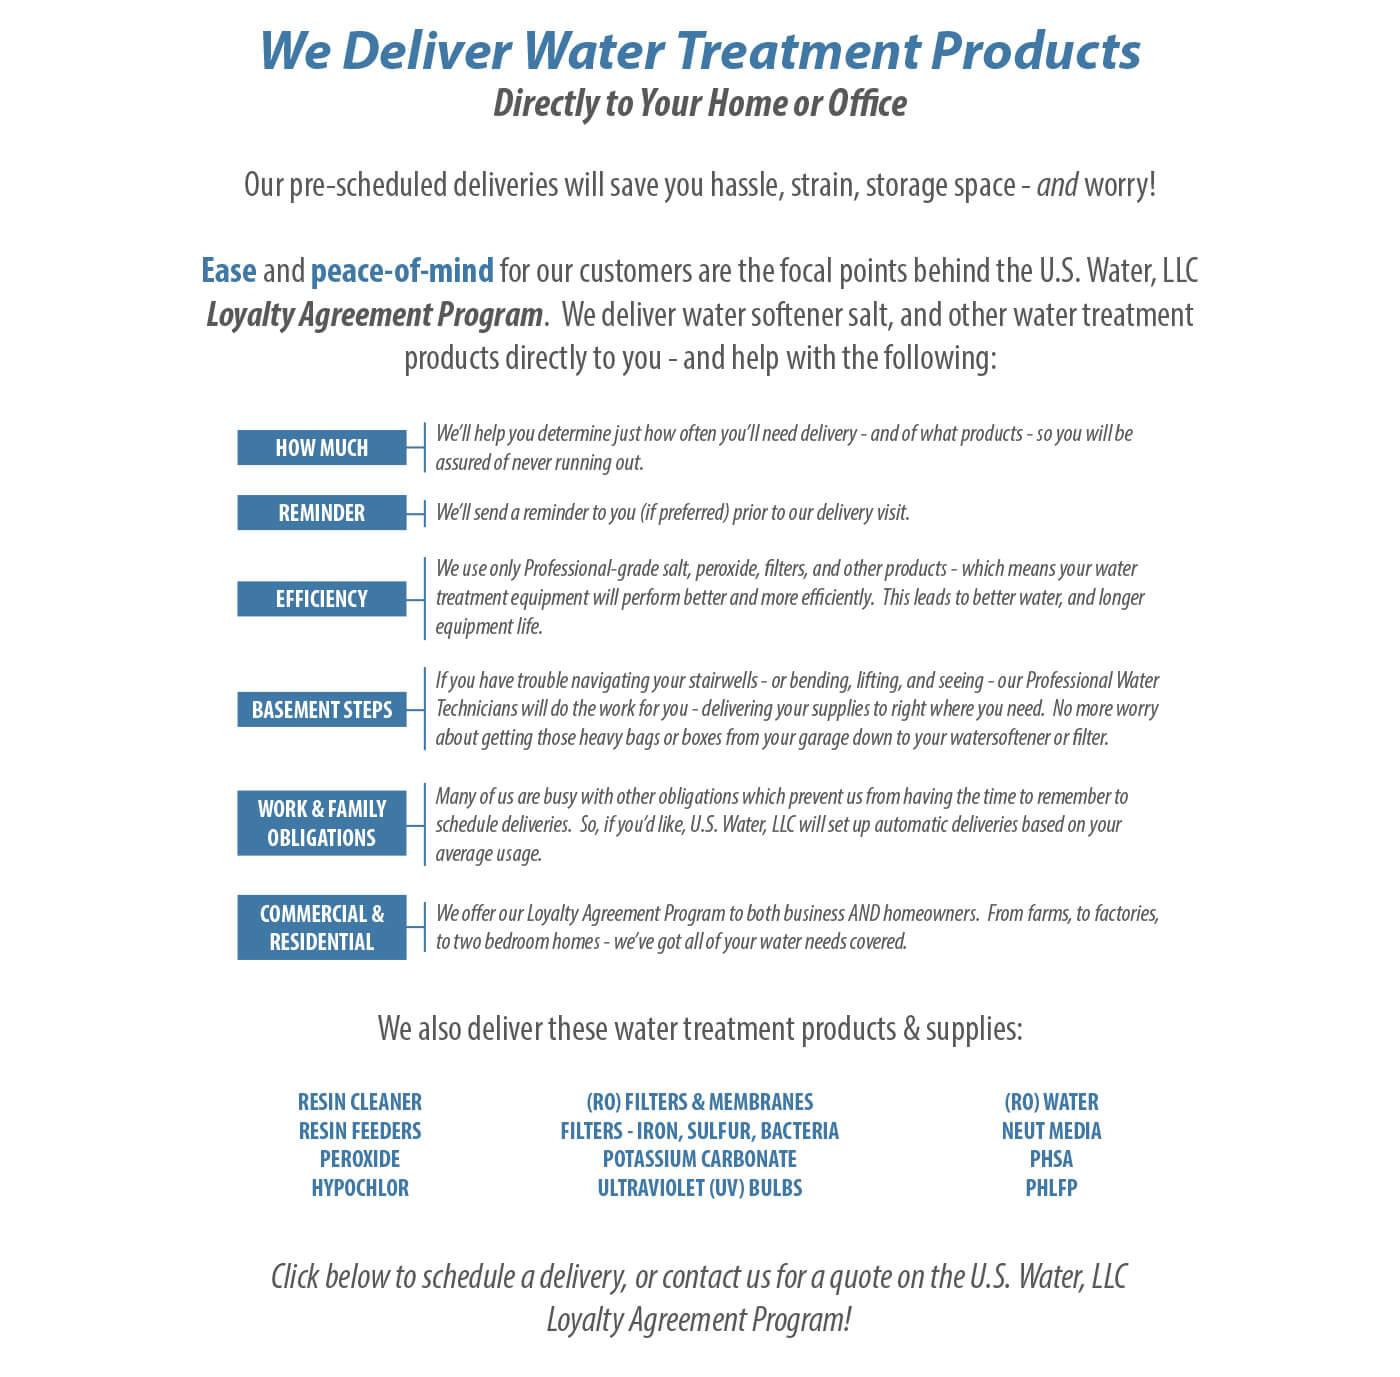 Water Softener Salt Delivery Us Water Llc